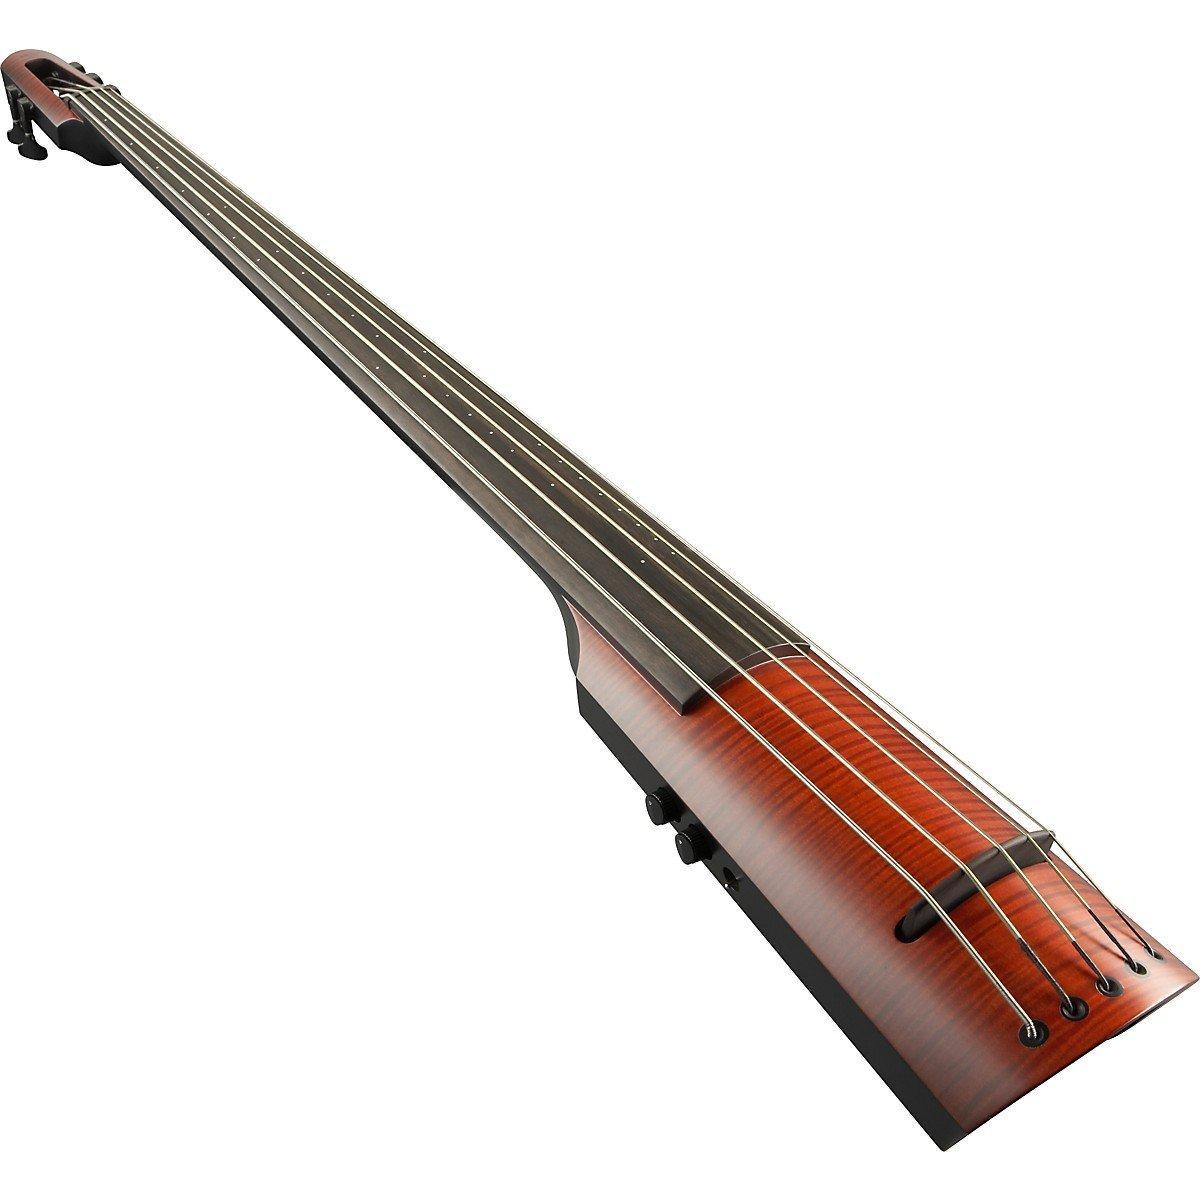 ns design nxta 5 string double bass. Black Bedroom Furniture Sets. Home Design Ideas